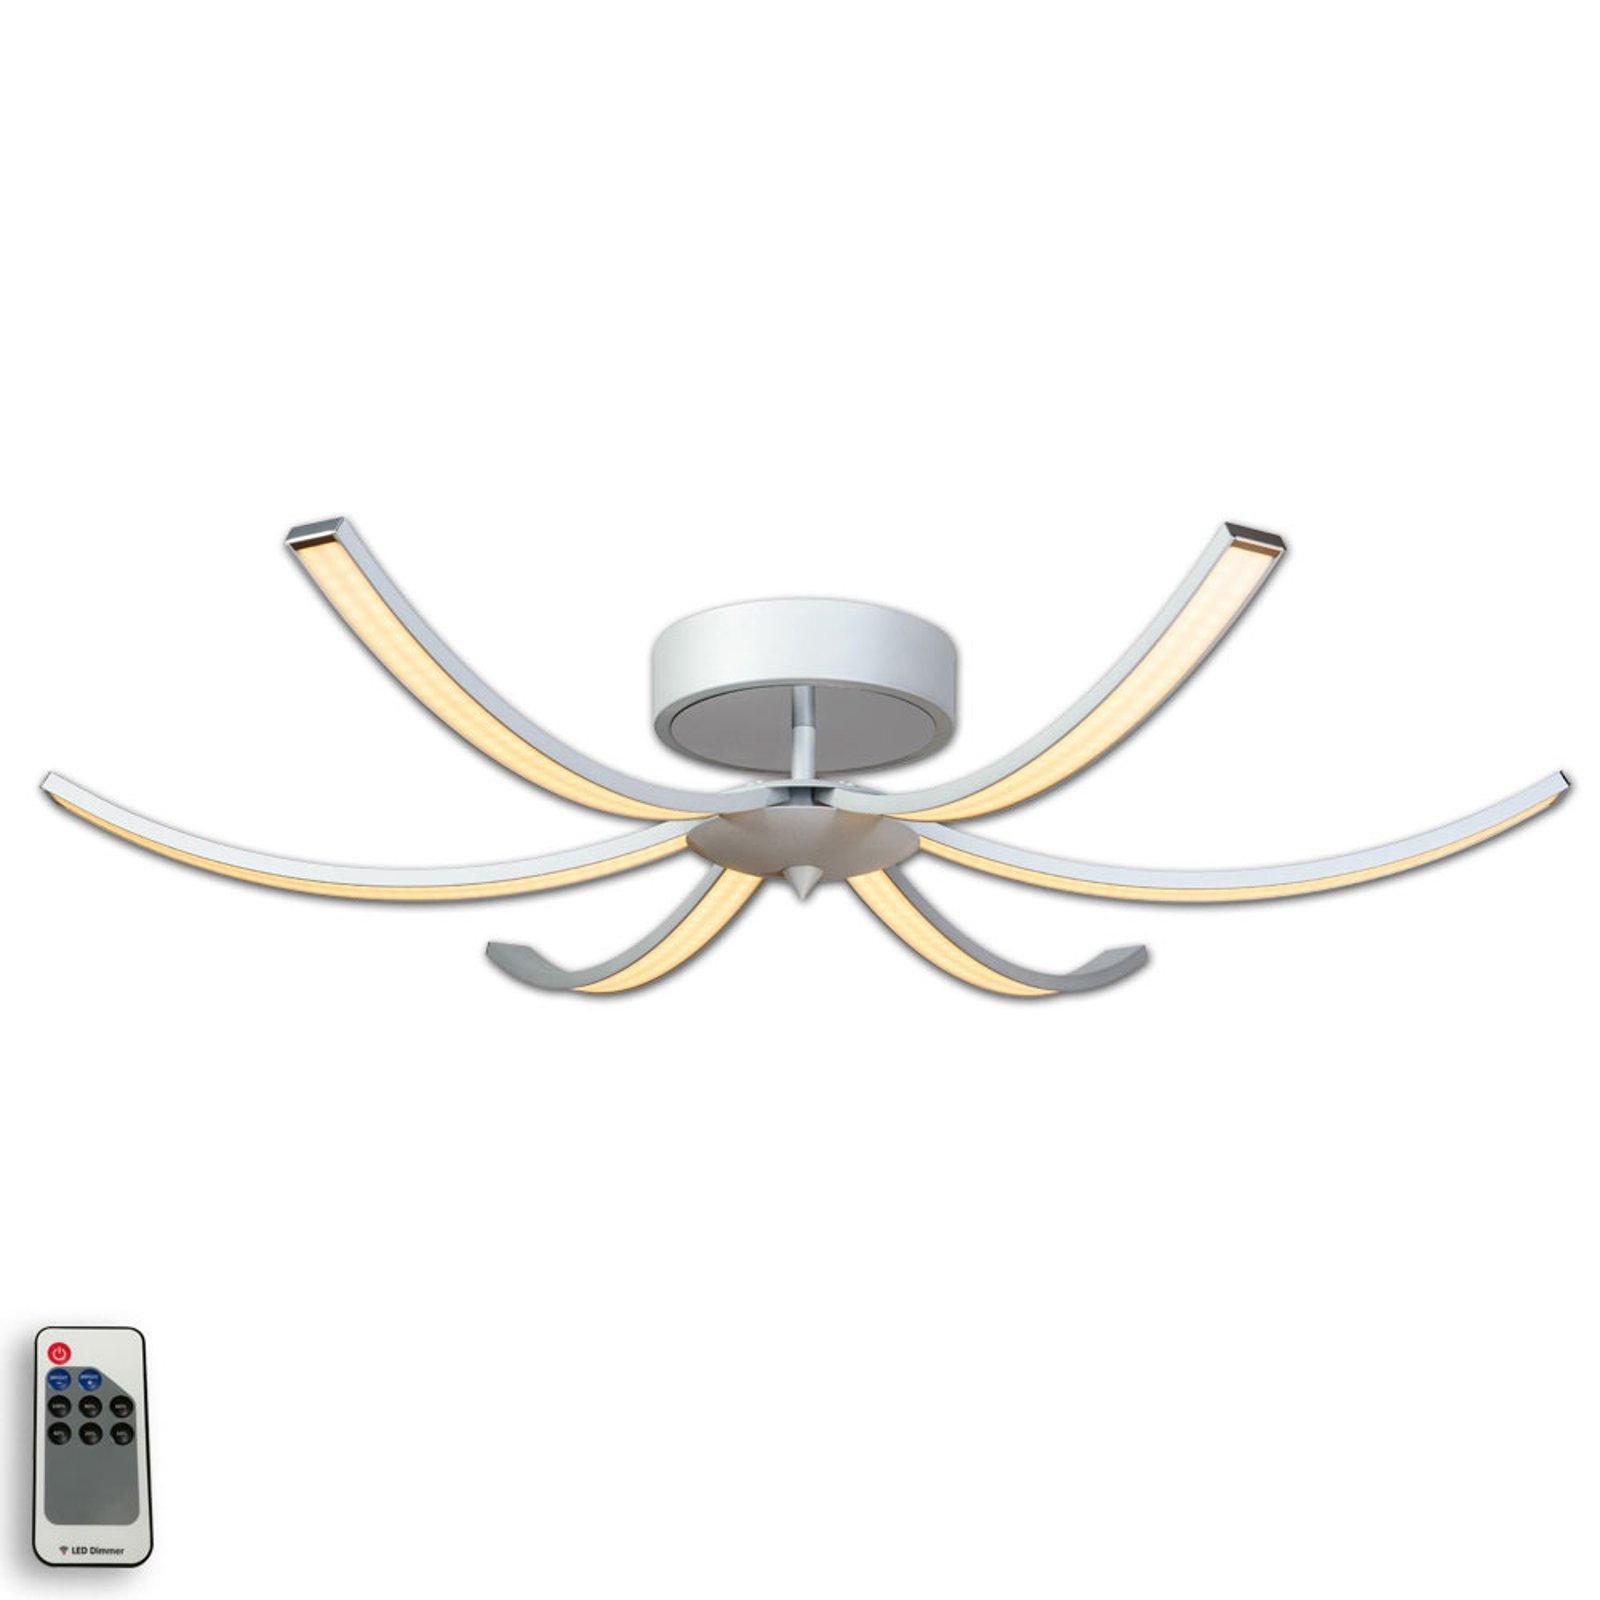 LED-taklampe Largo, 6 lyskilder, 91 cm aluminium